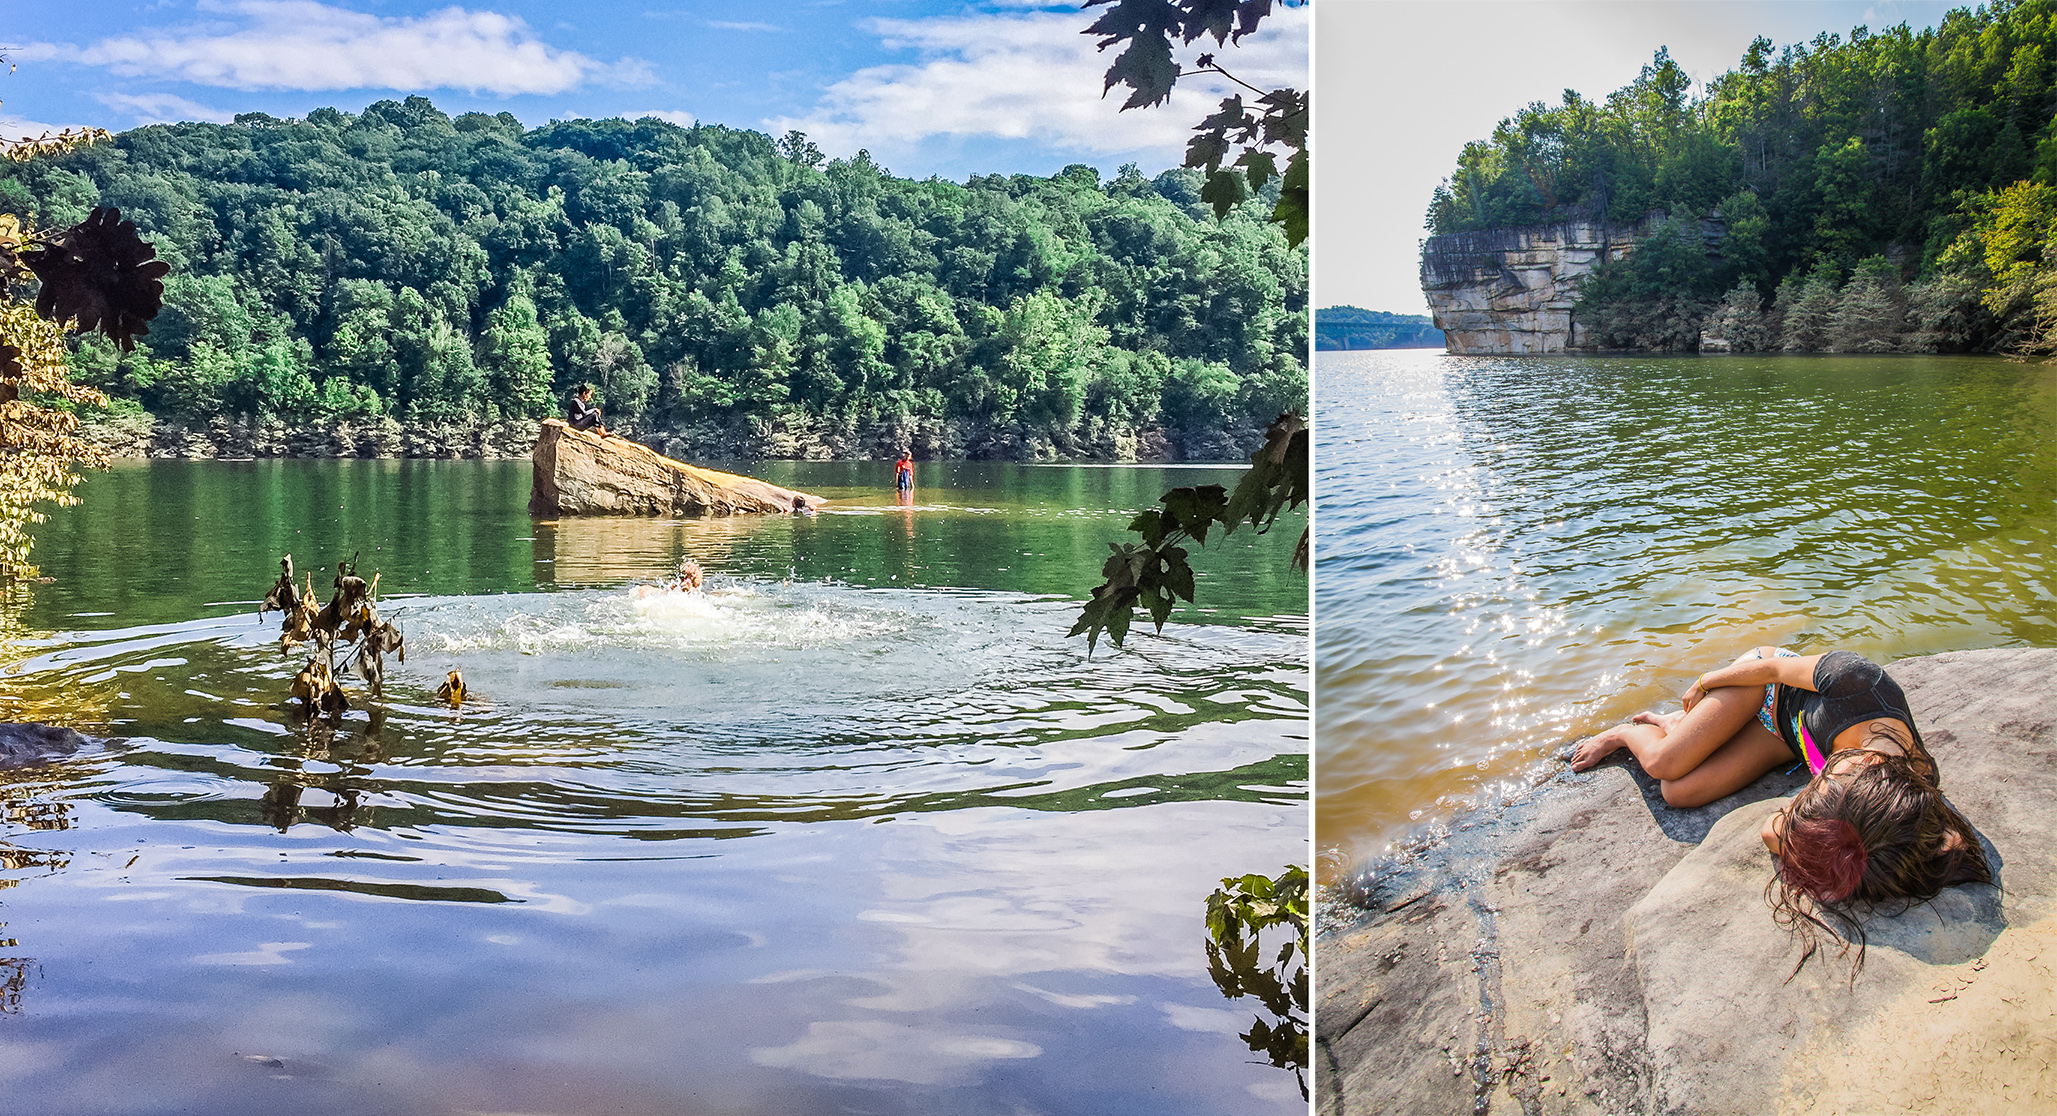 Summersville Lake, West Virginia